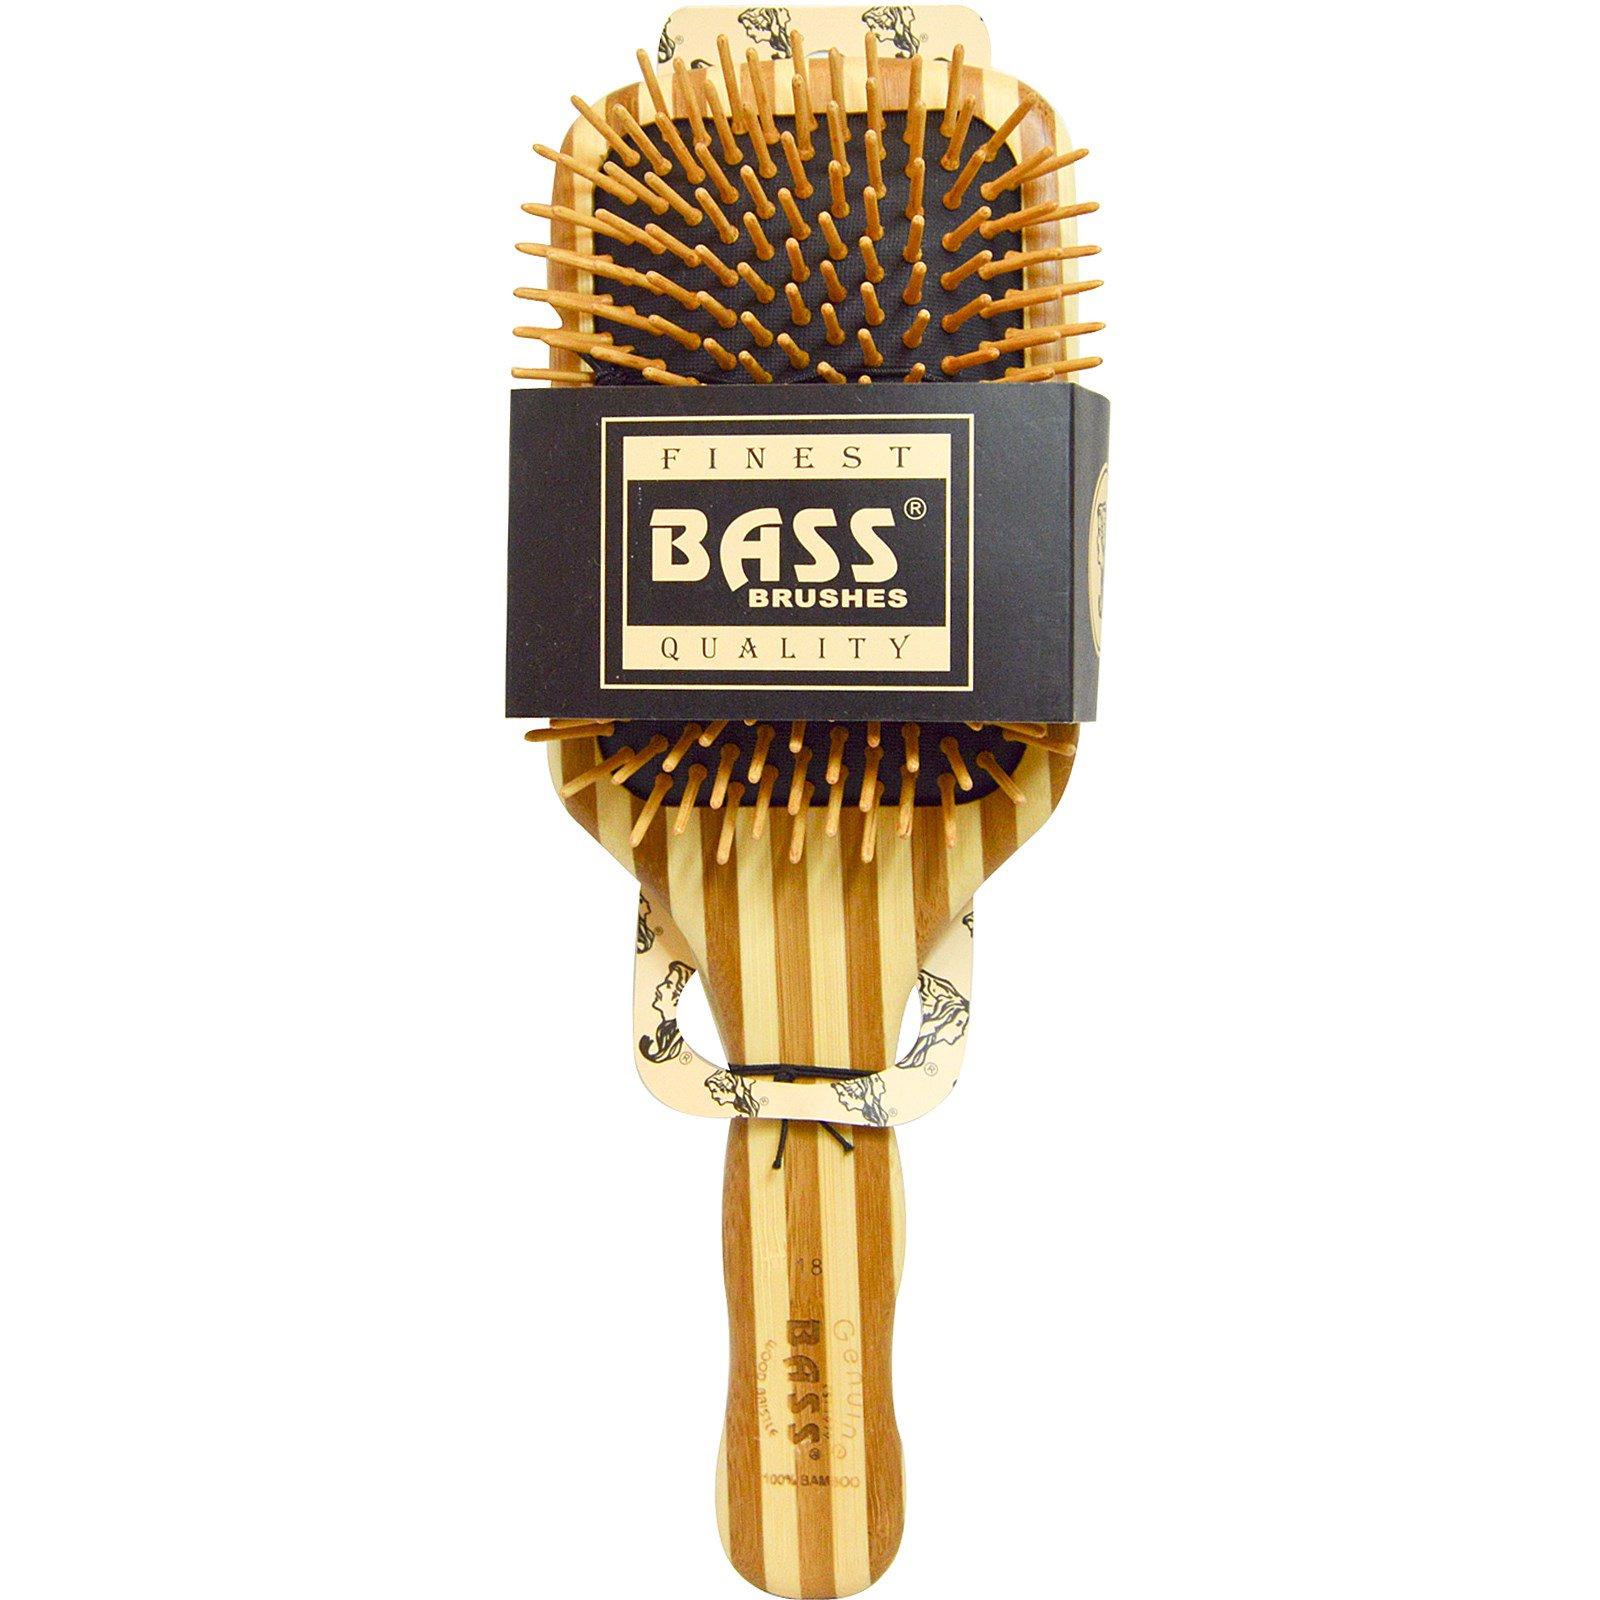 Bass Brushes Large Square Paddle Brush Cushion Wood Bristles With Hair Brus Stripped Bamboo Handle